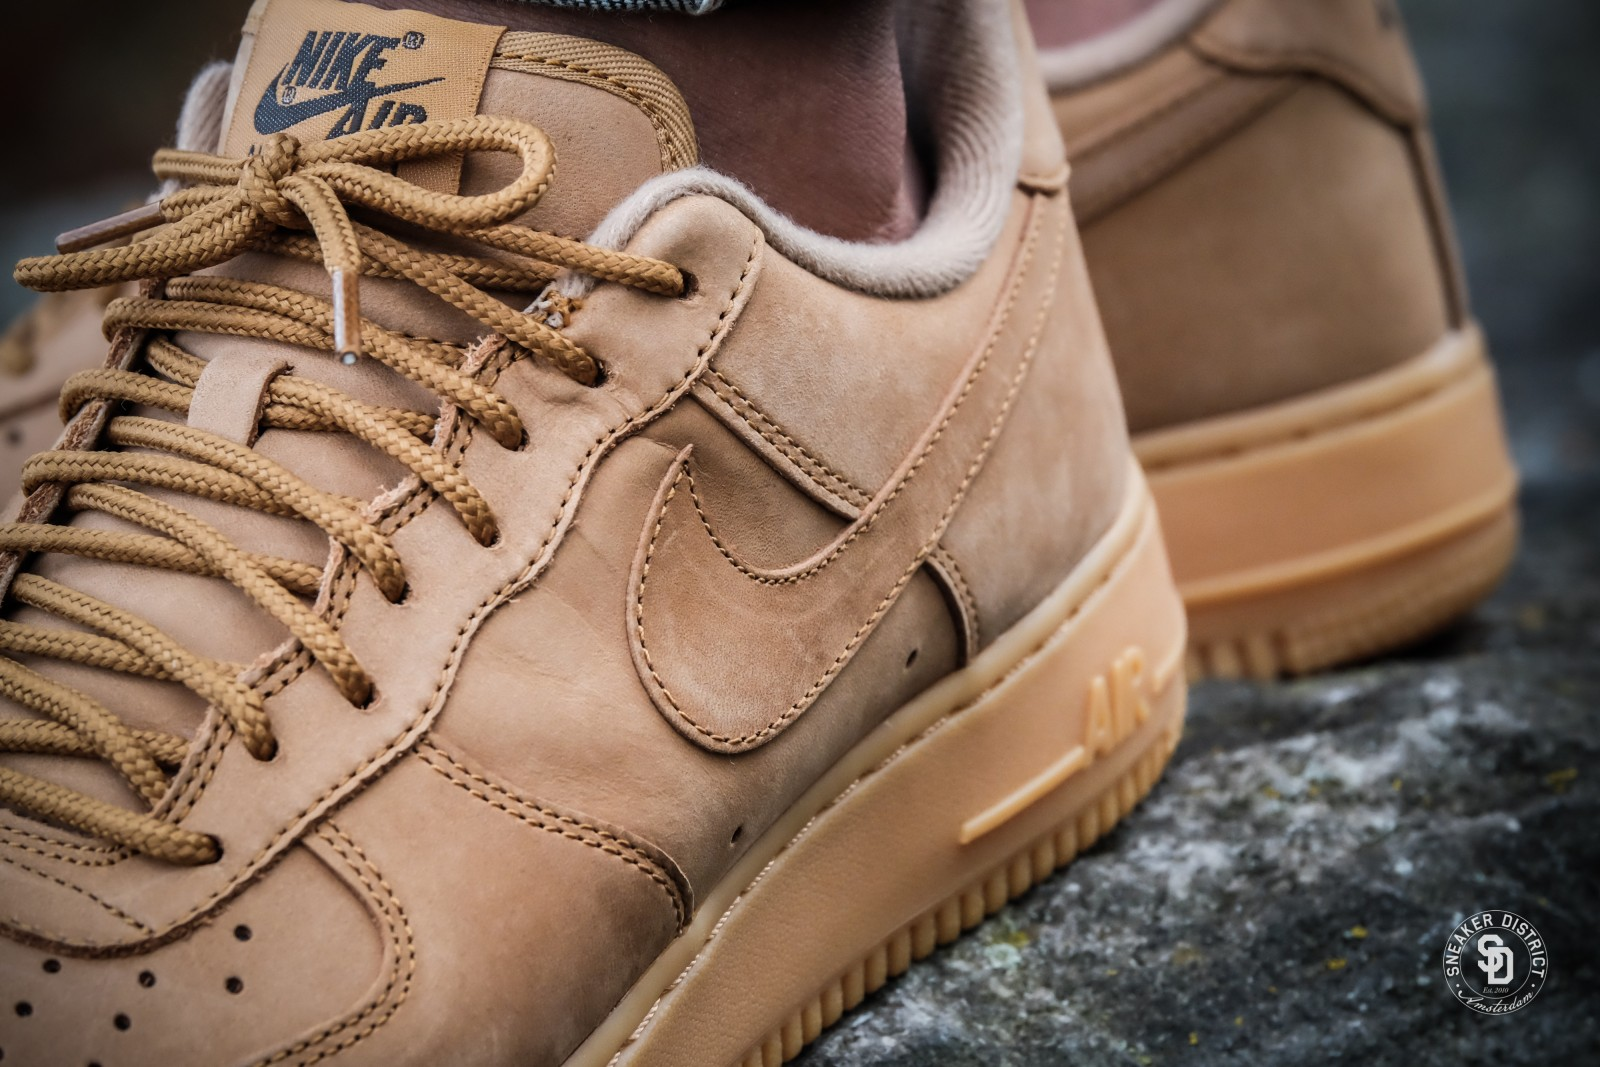 Nike Air Force 1 '07 WB Flax/Gum Light Brown-Outdoor Green